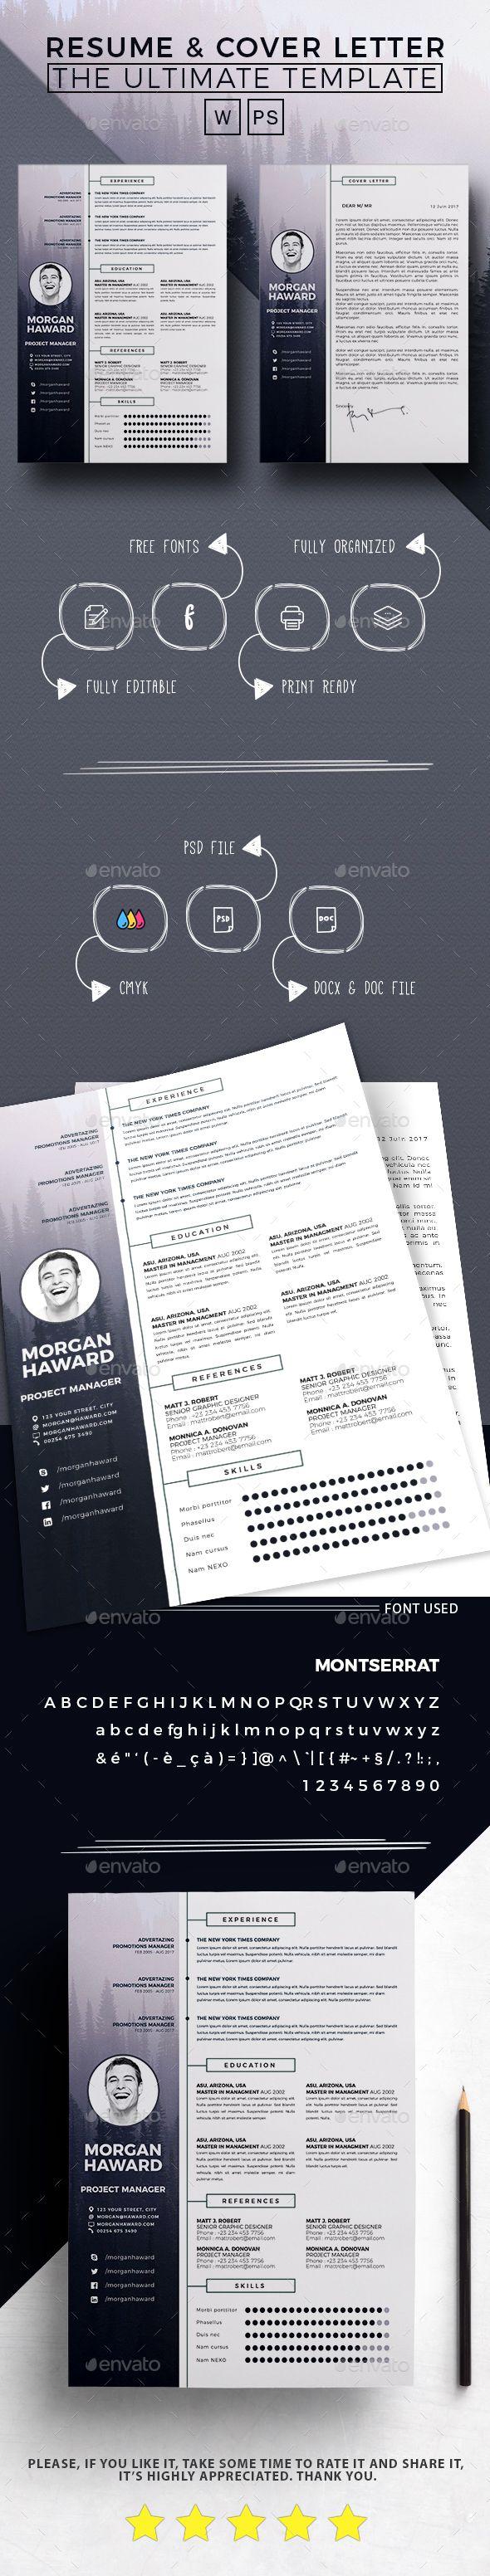 Resume  Morgan  #resume design #skills  • Download here → https://graphicriver.net/item/resume-morgan-/20858475?ref=pxcr